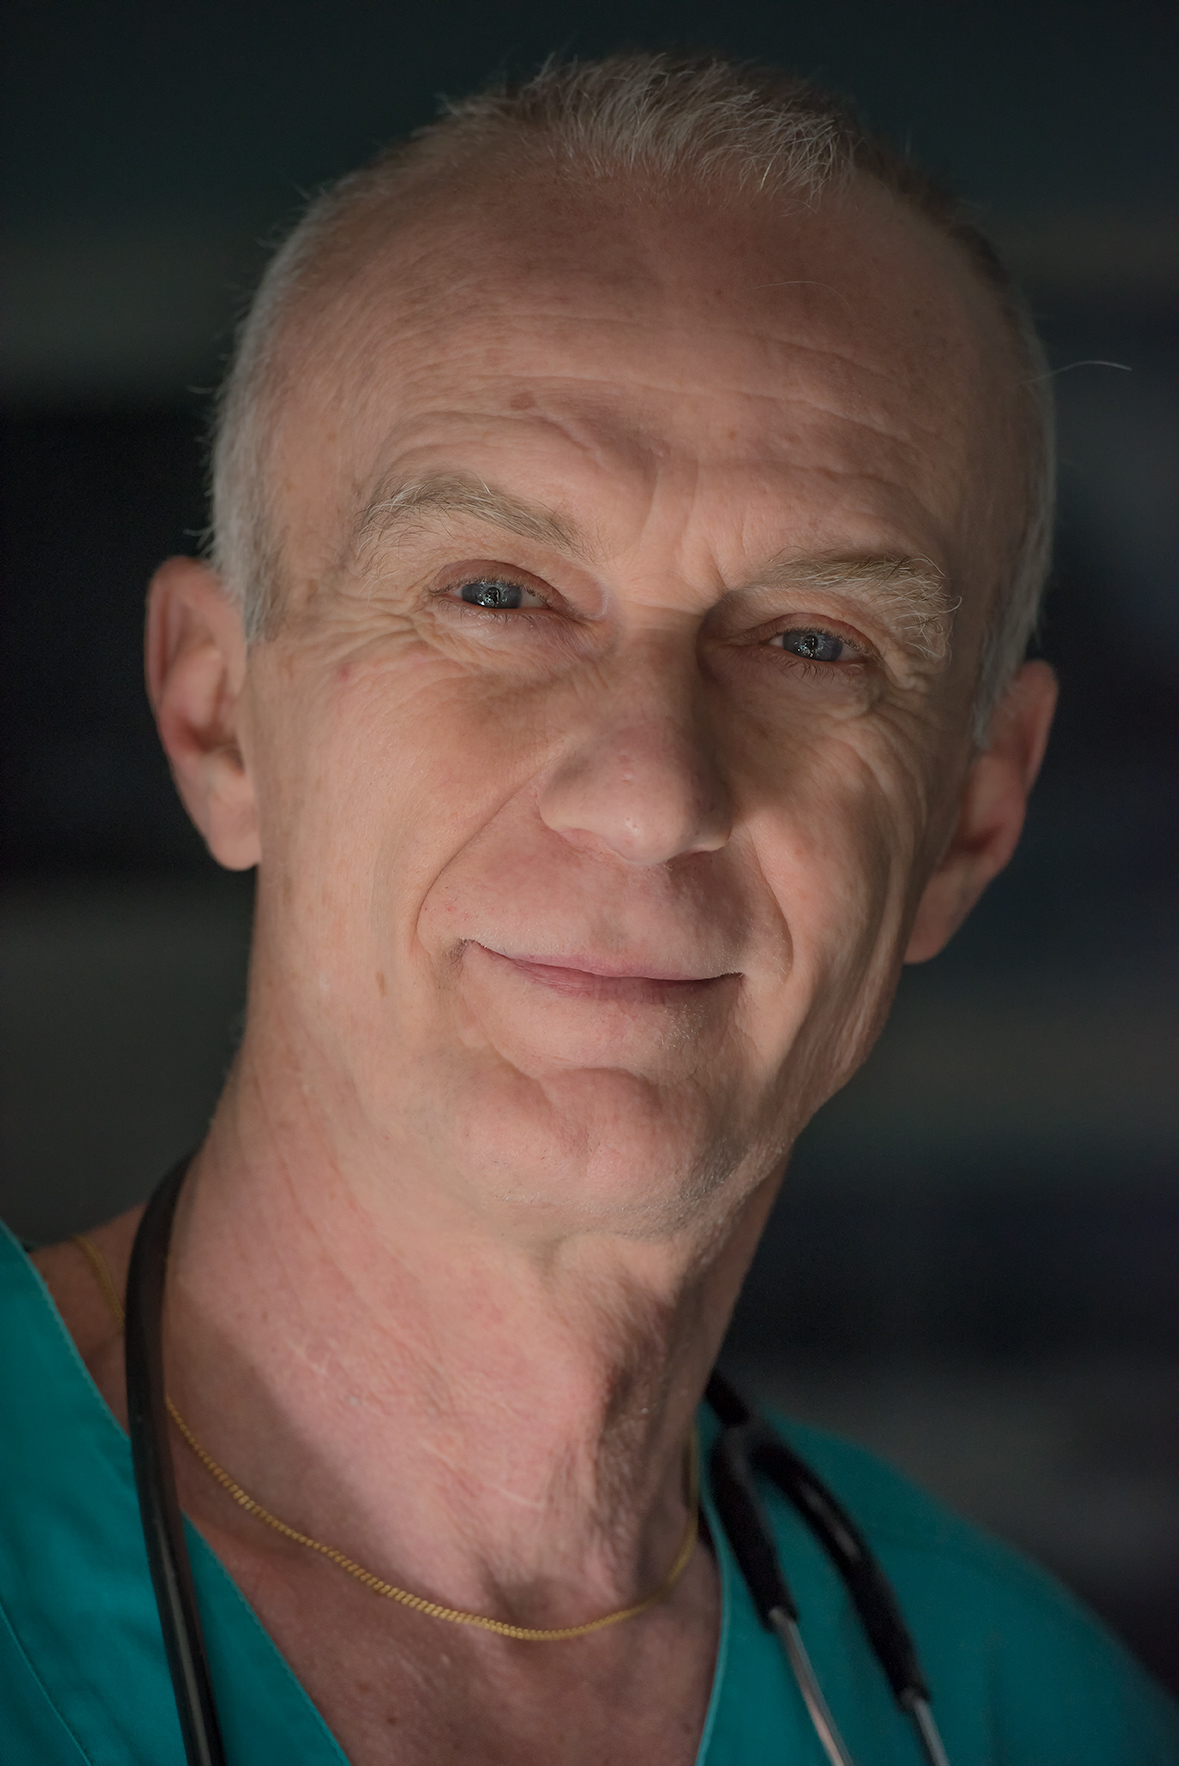 dott. Fabrizio de Gasperis